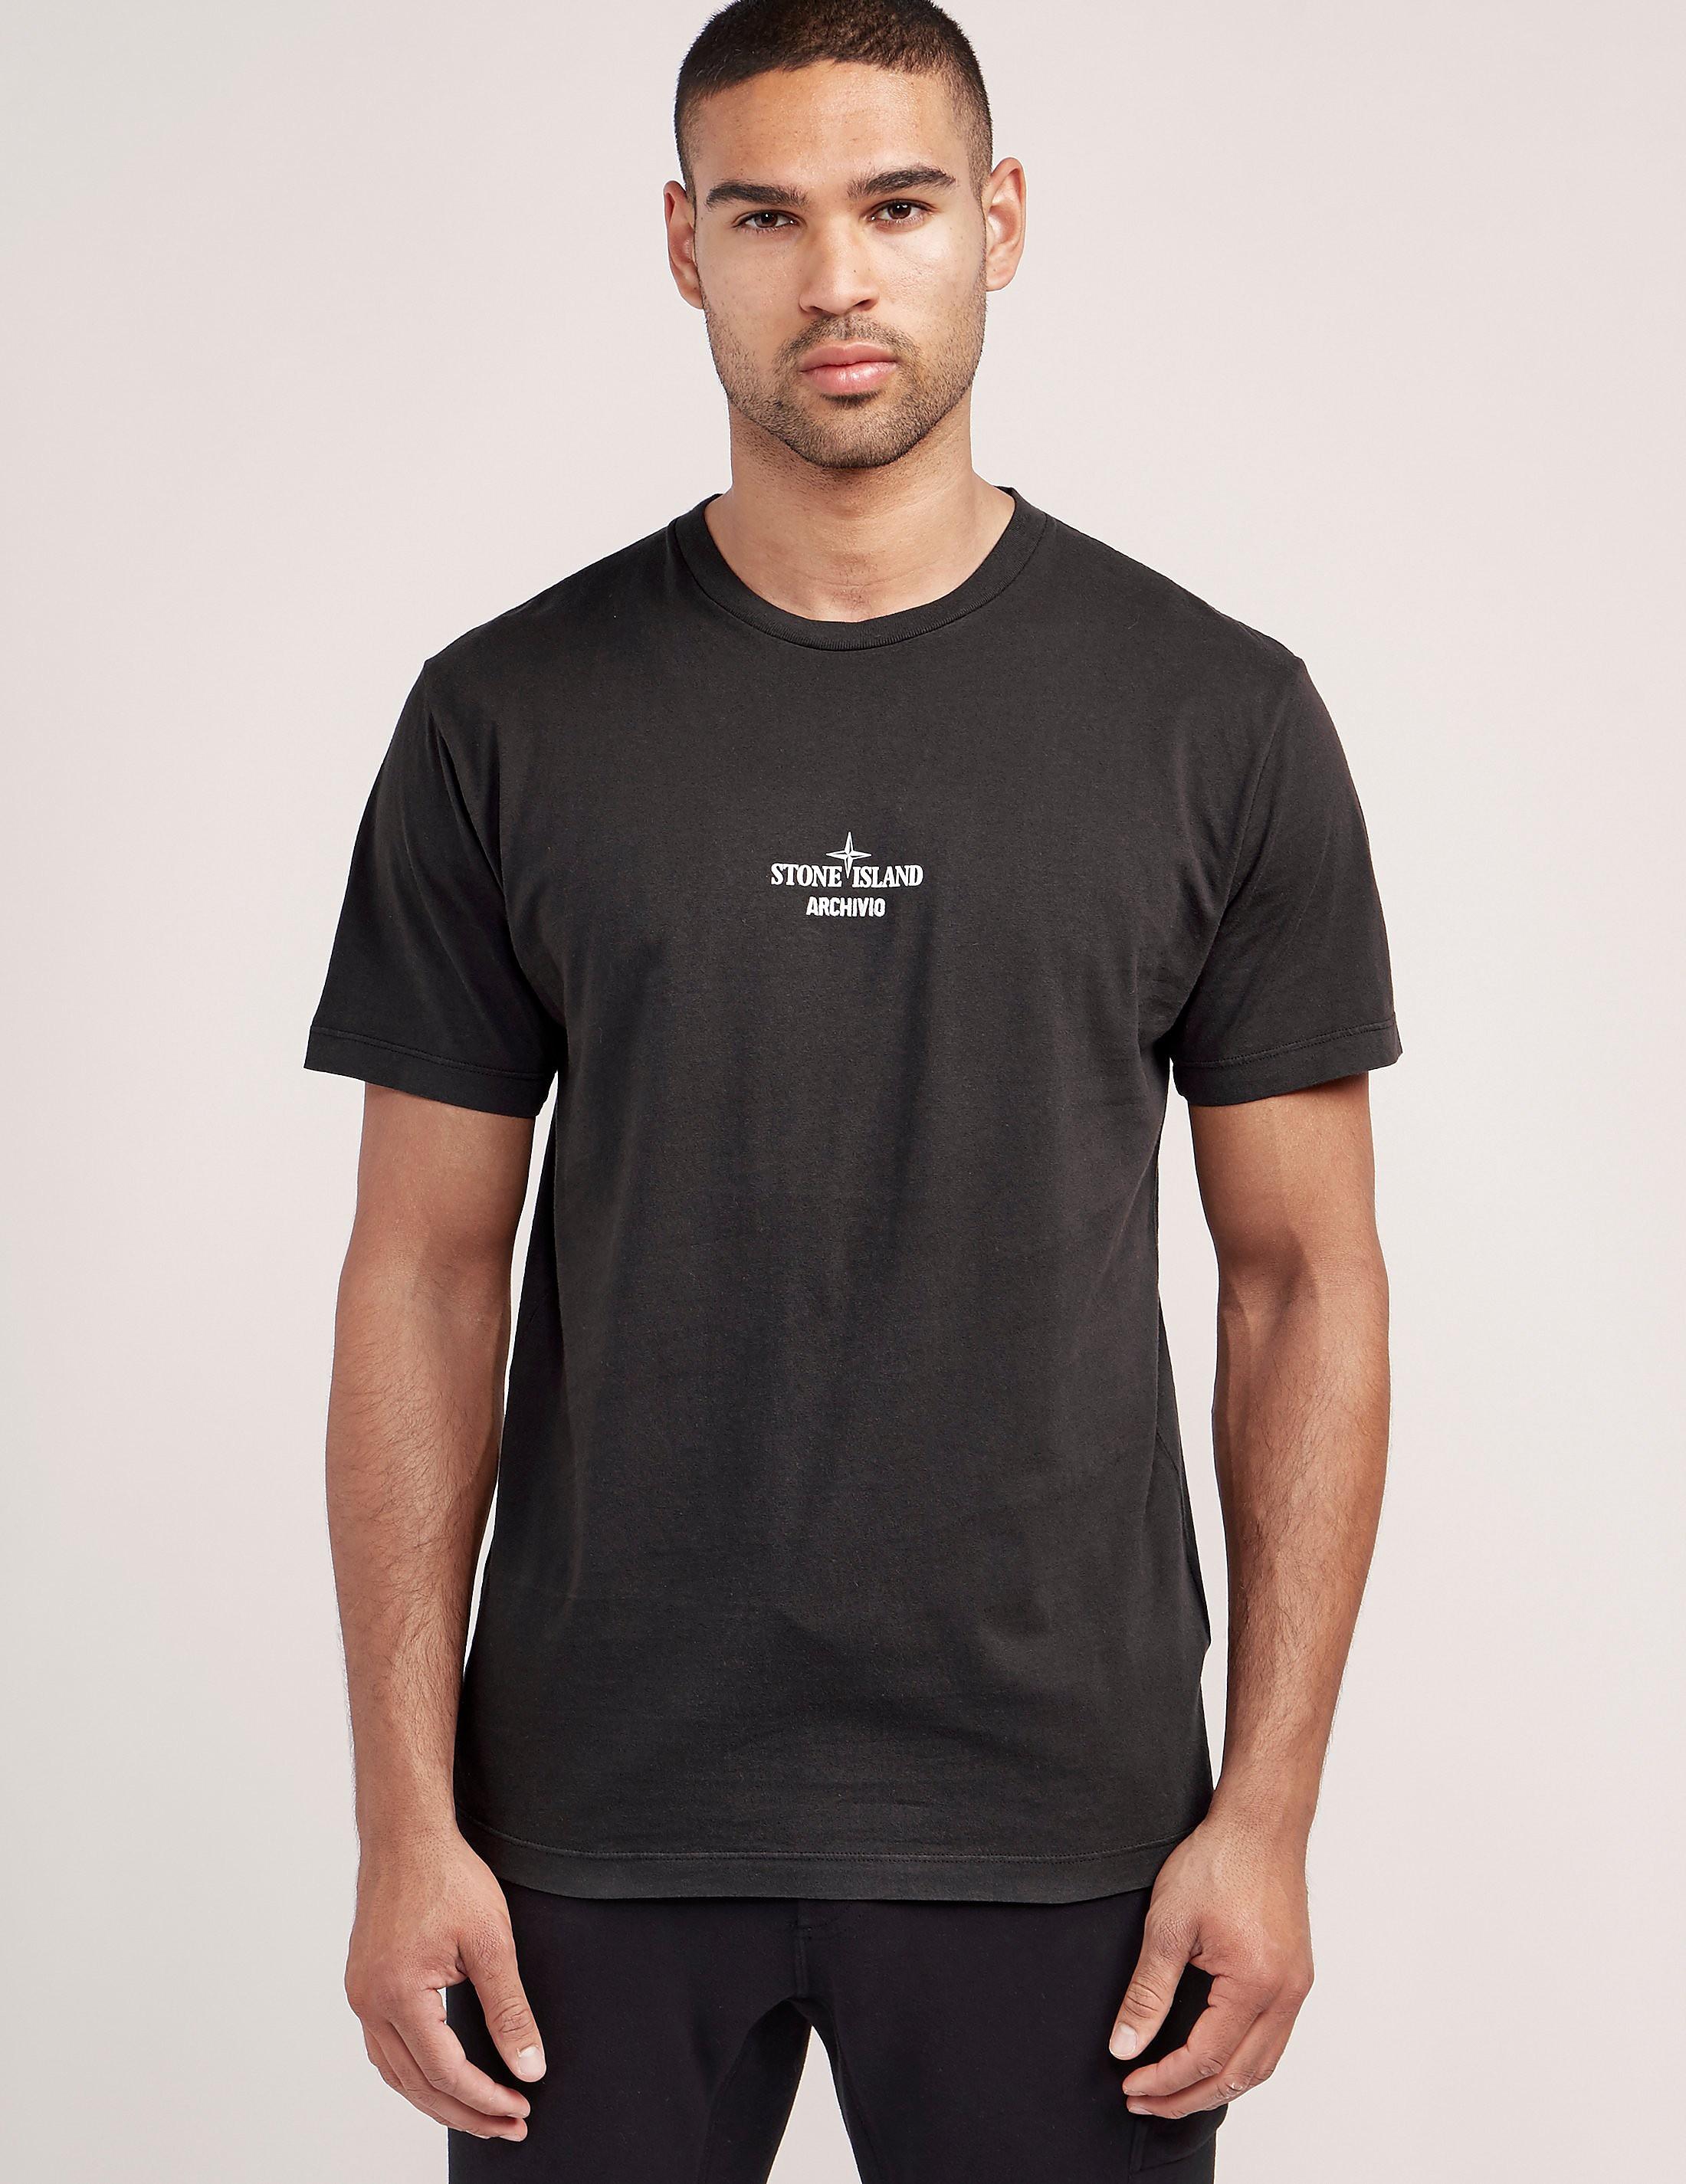 Stone Island Archivo T-Shirt